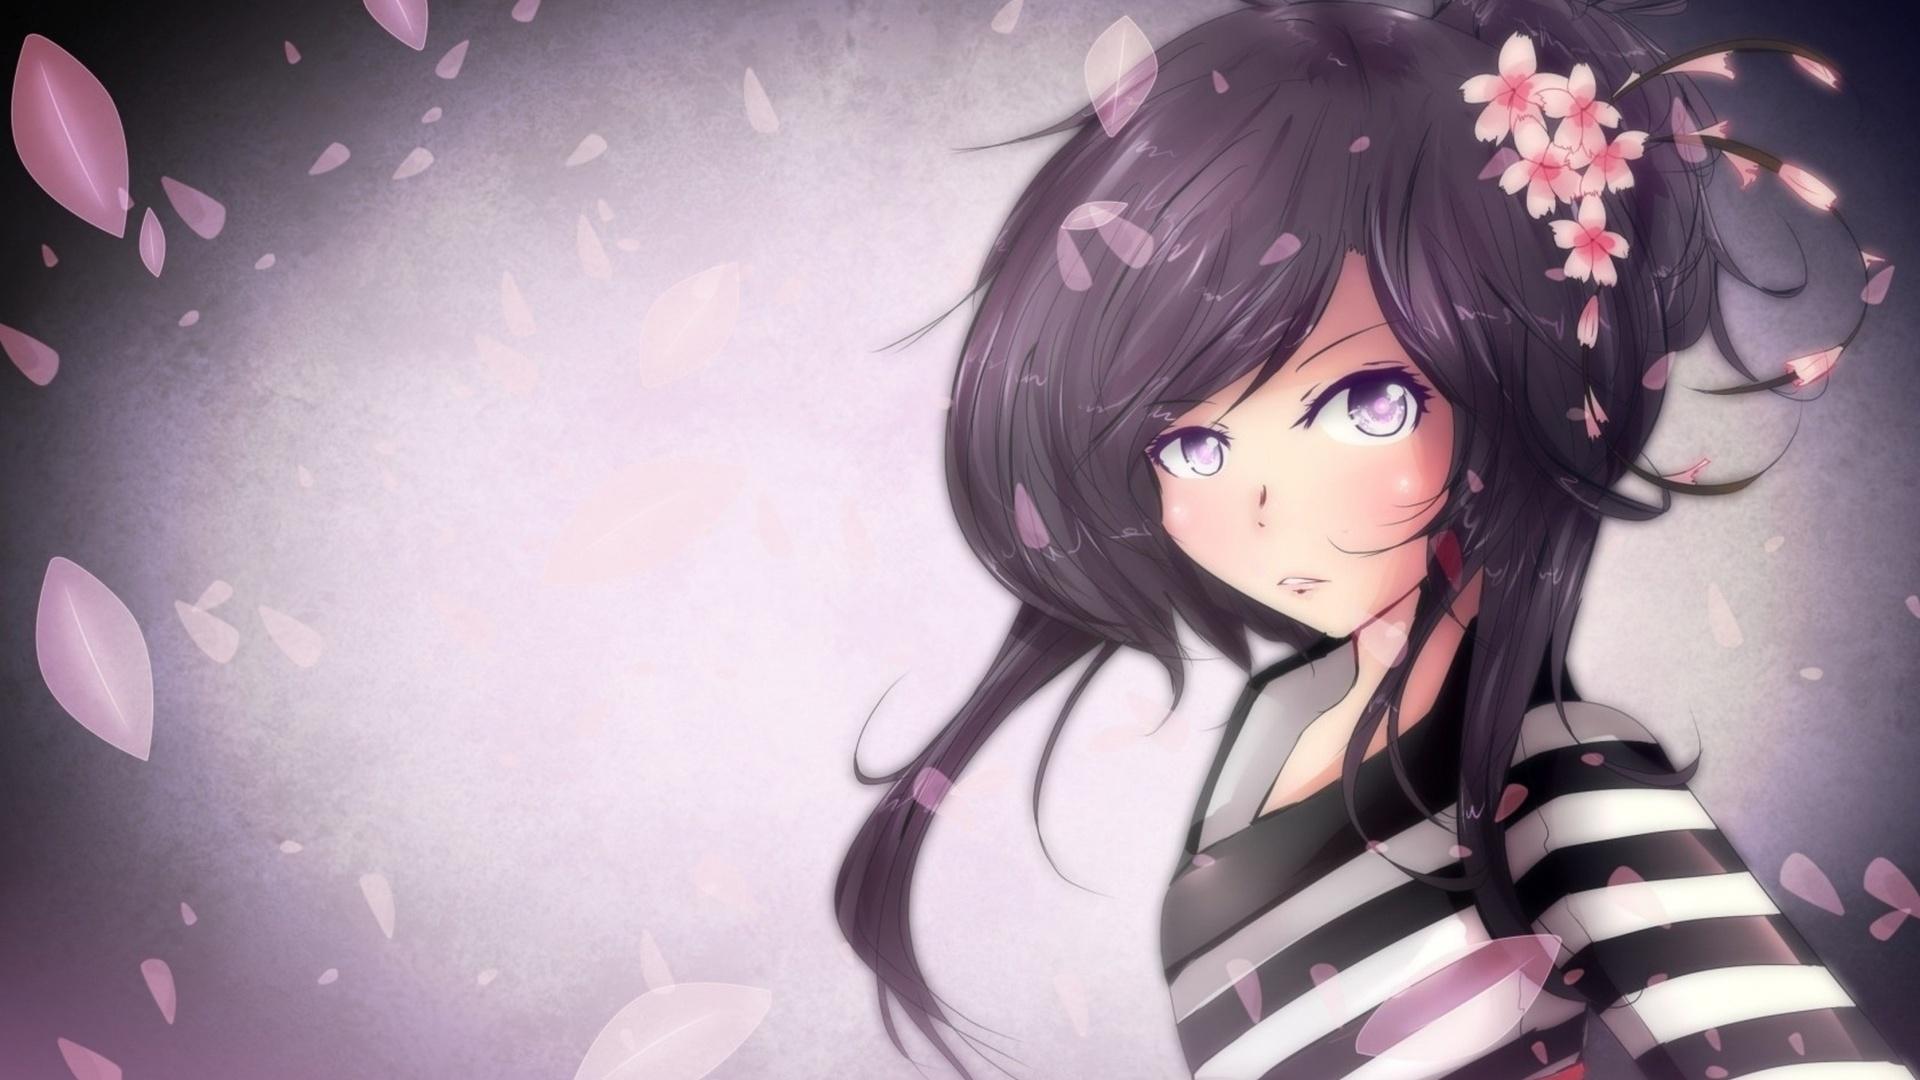 Free download Download Purple Anime Girl Wallpaper in